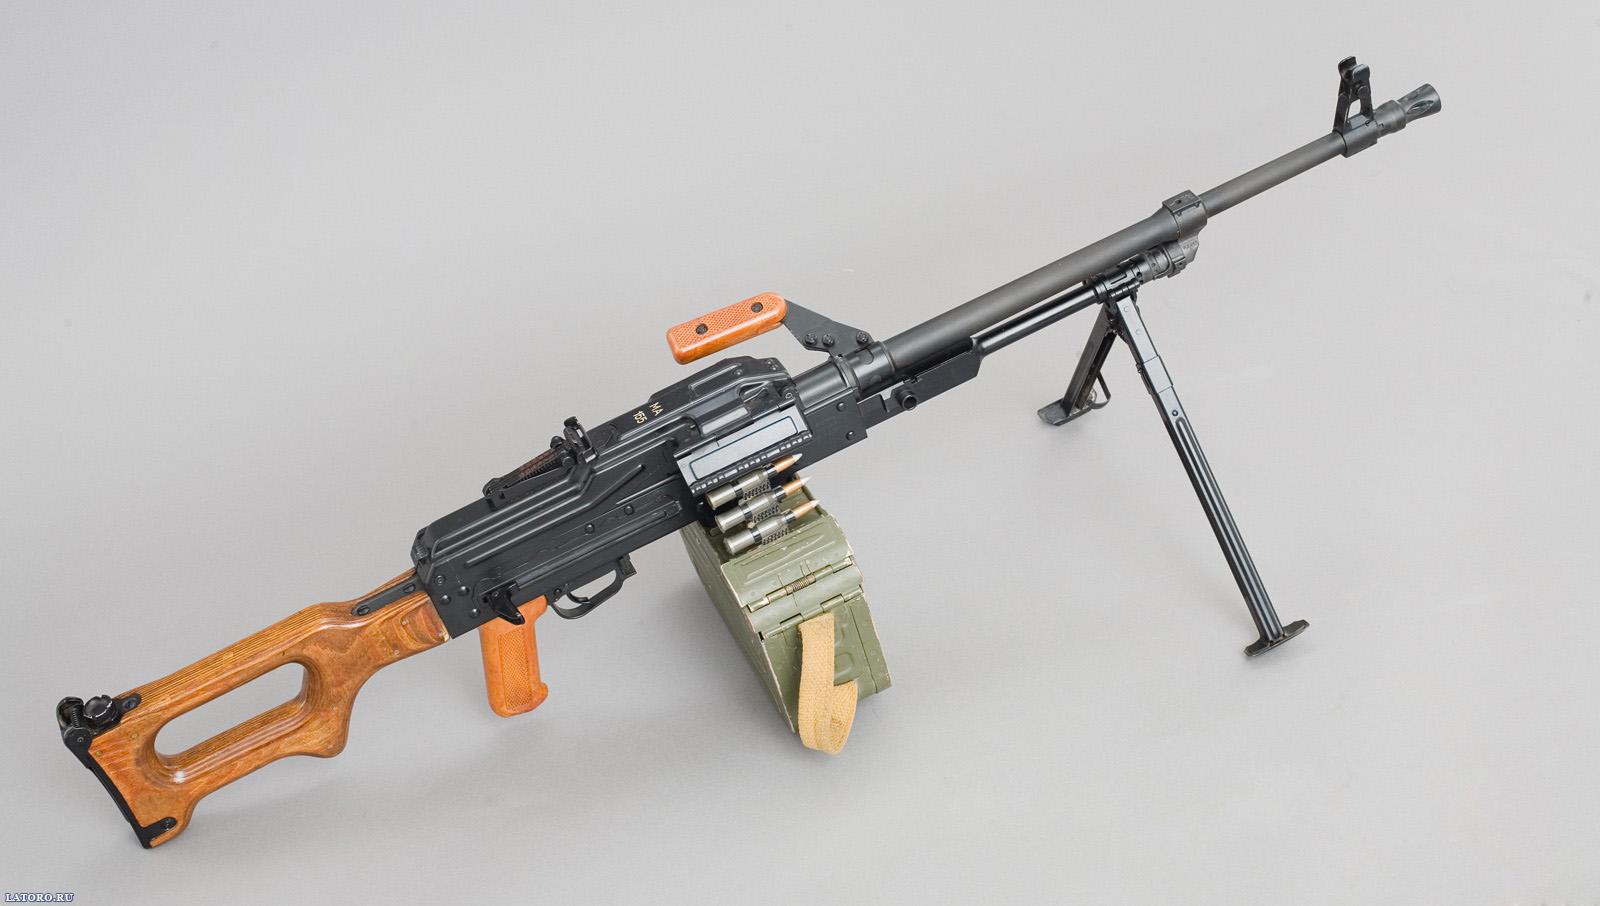 PKM Kalashnikov machine gun Desktop Wallpapers FREE on Latorocom 1600x906